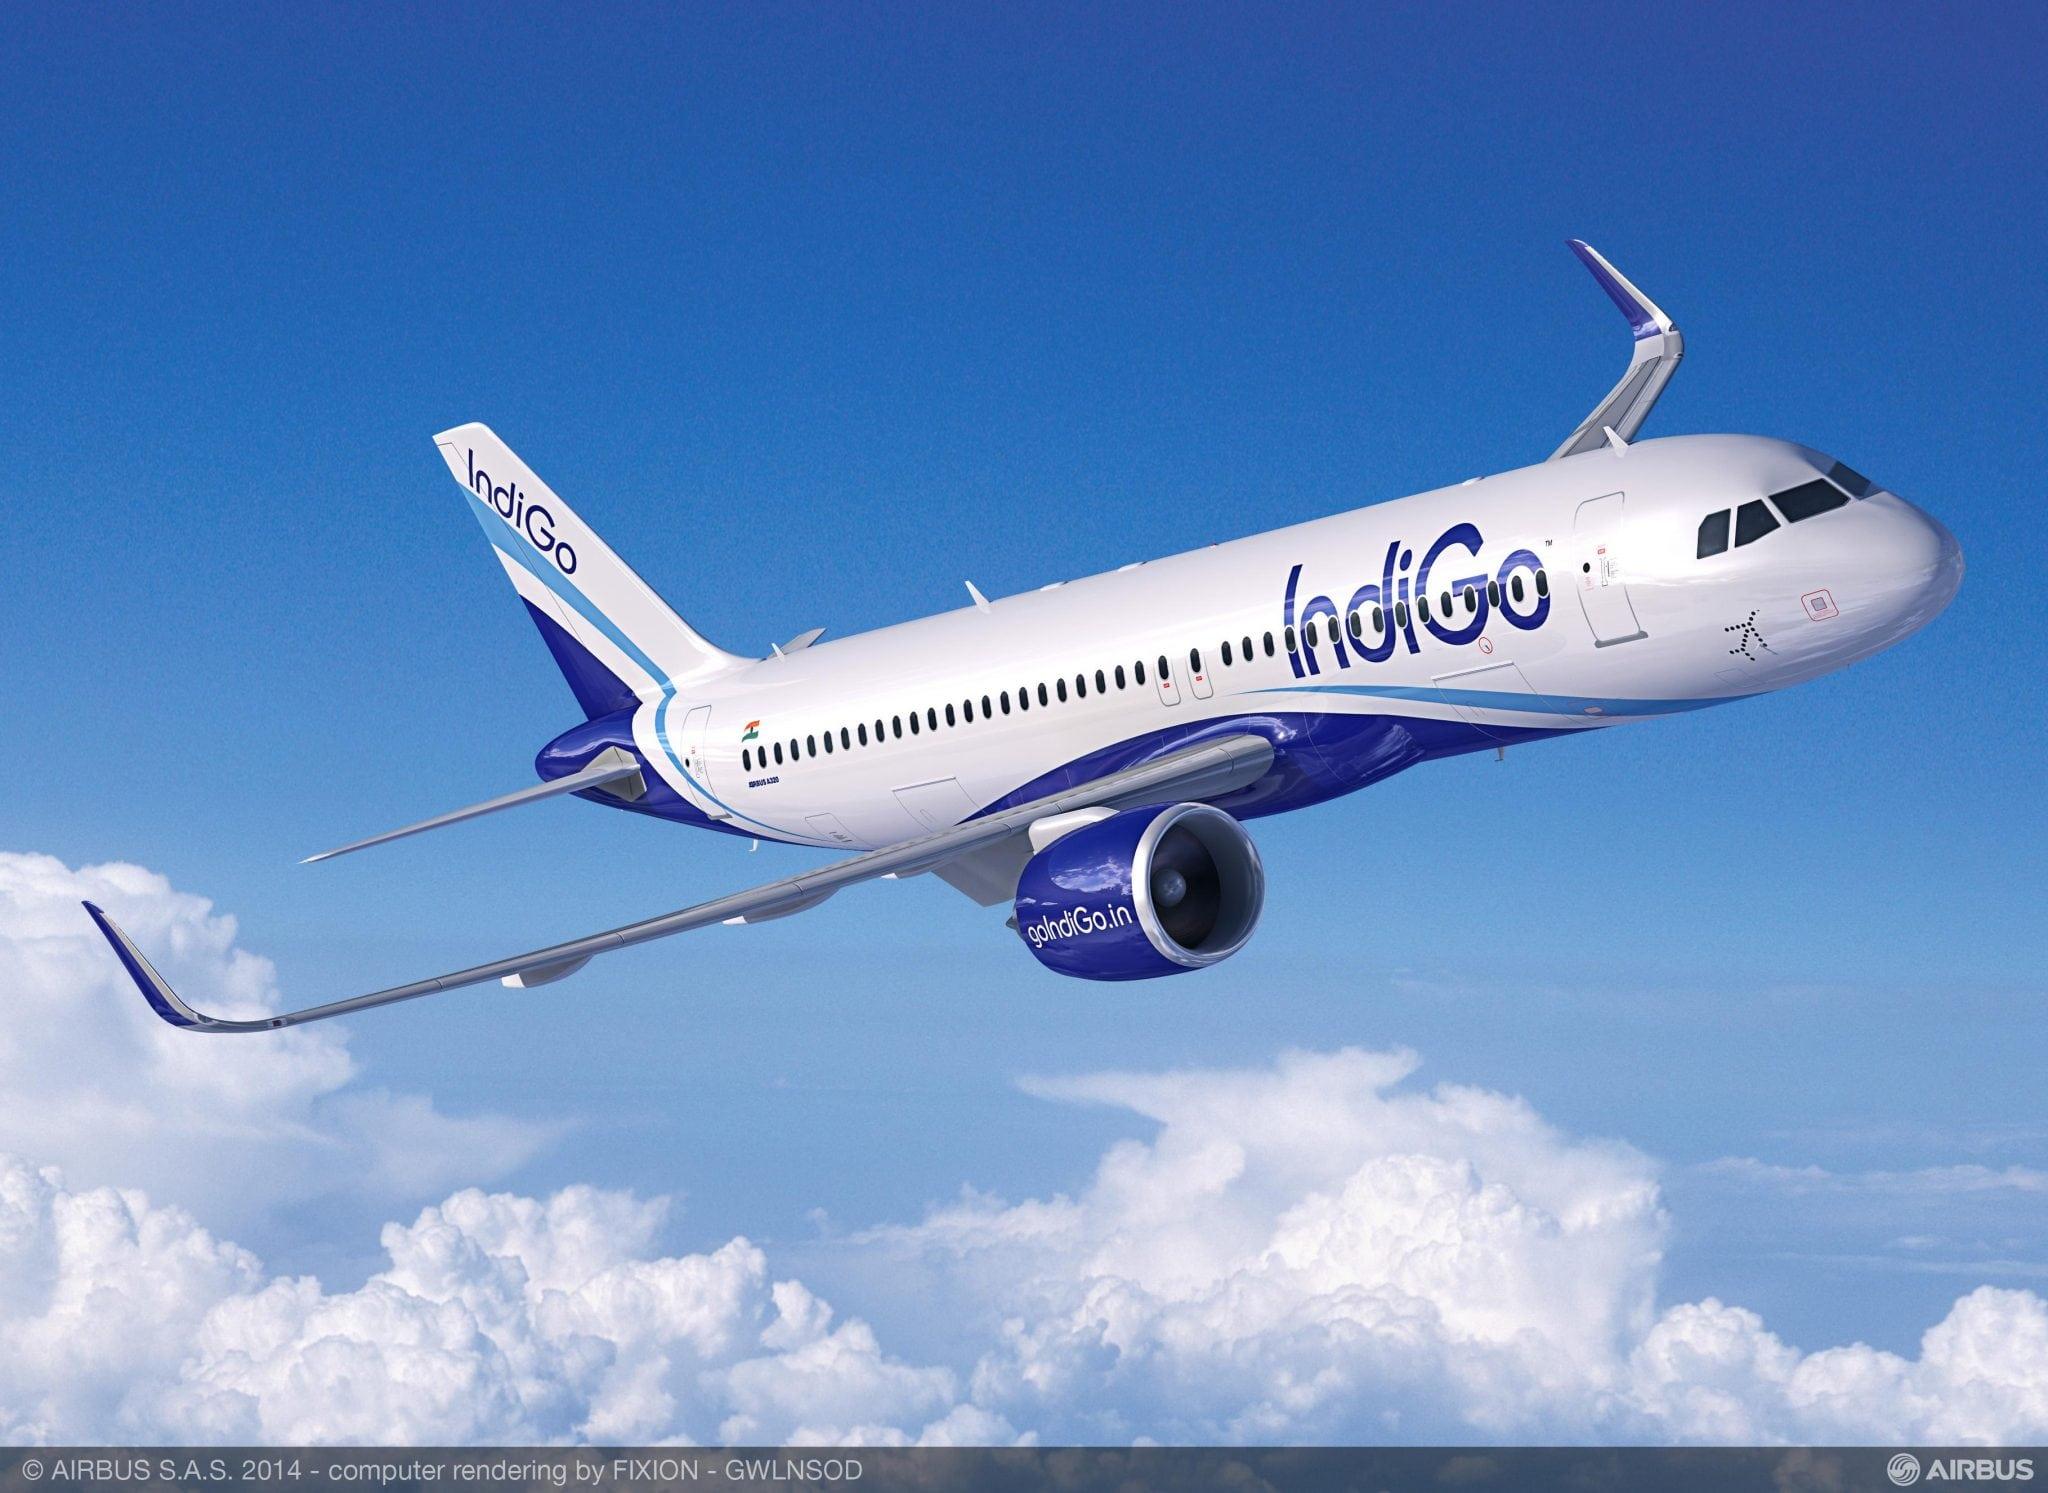 IndiGo A320neo in flight